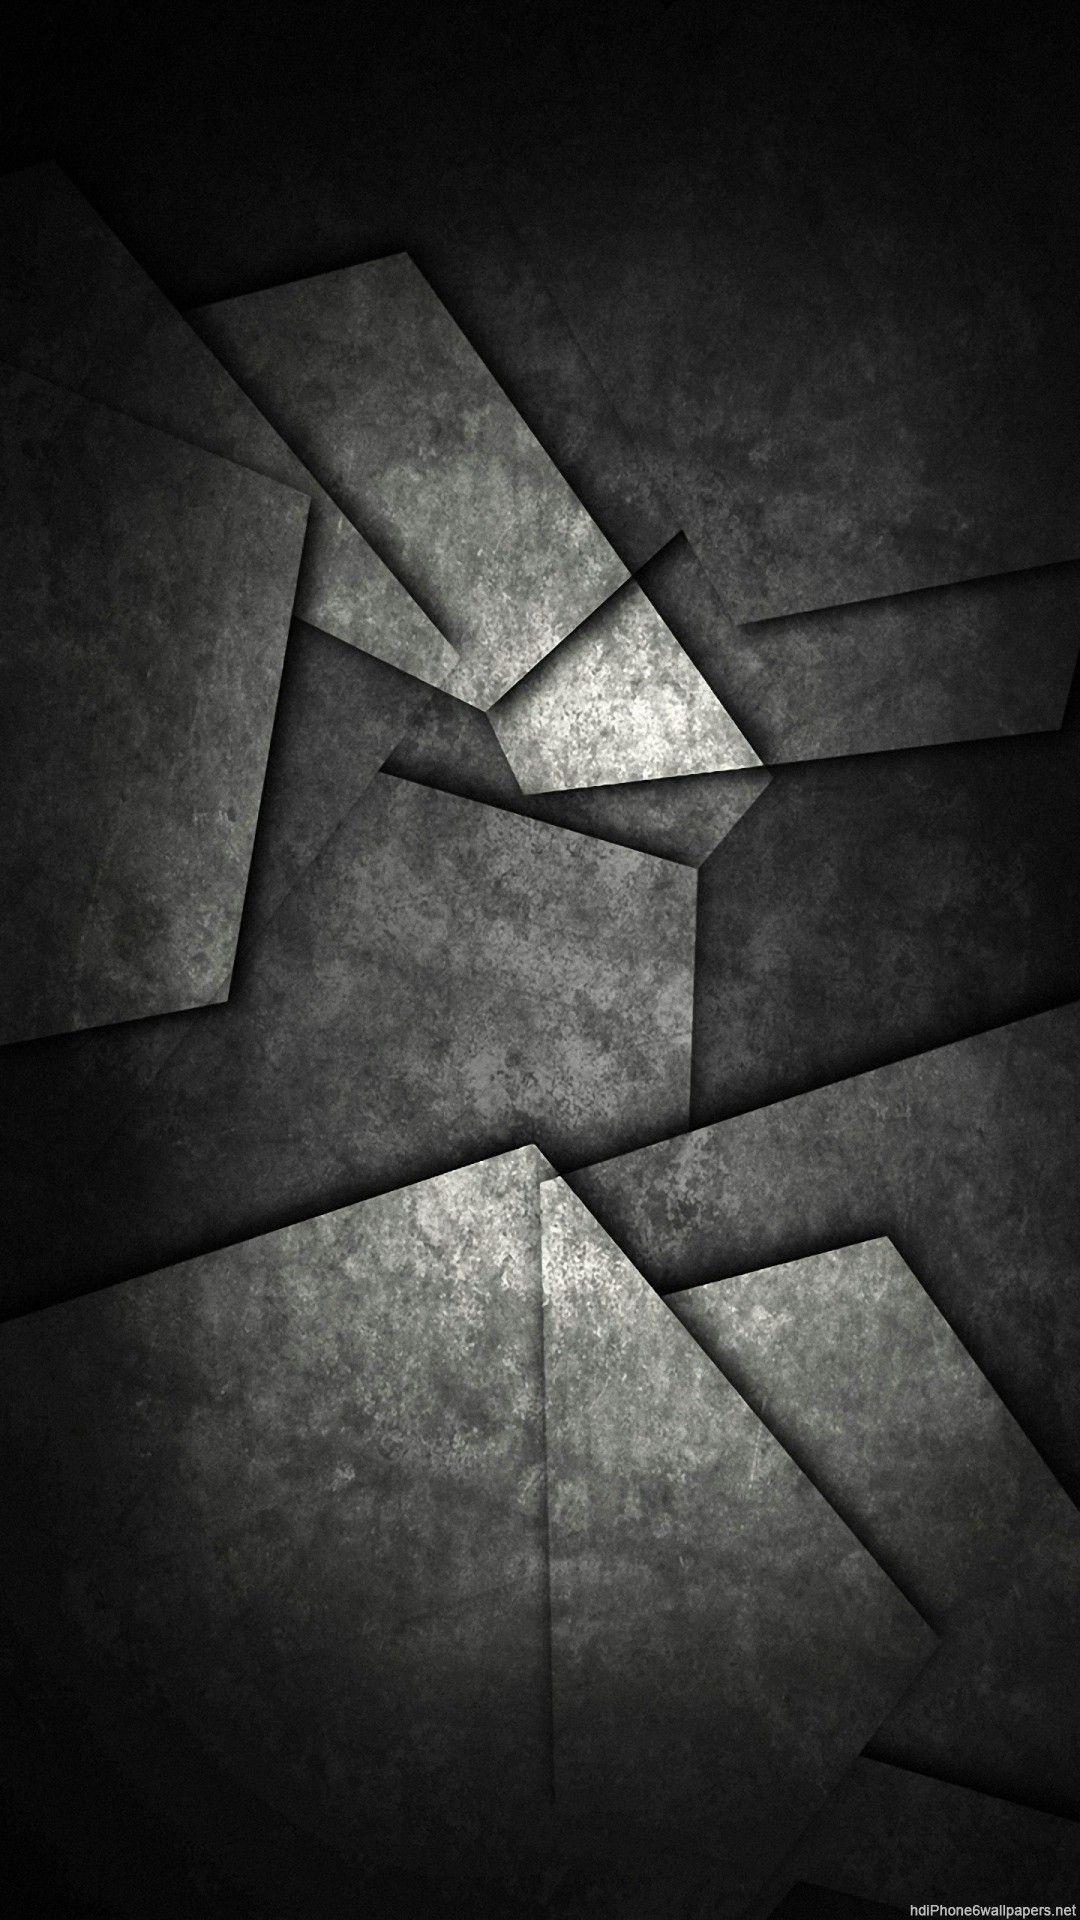 1080x1920 1080 X 1920 Clipart Hd Vertical Black Hd Wallpaper Iphone Cute Black Wallpaper Iphone 6 Wallpaper